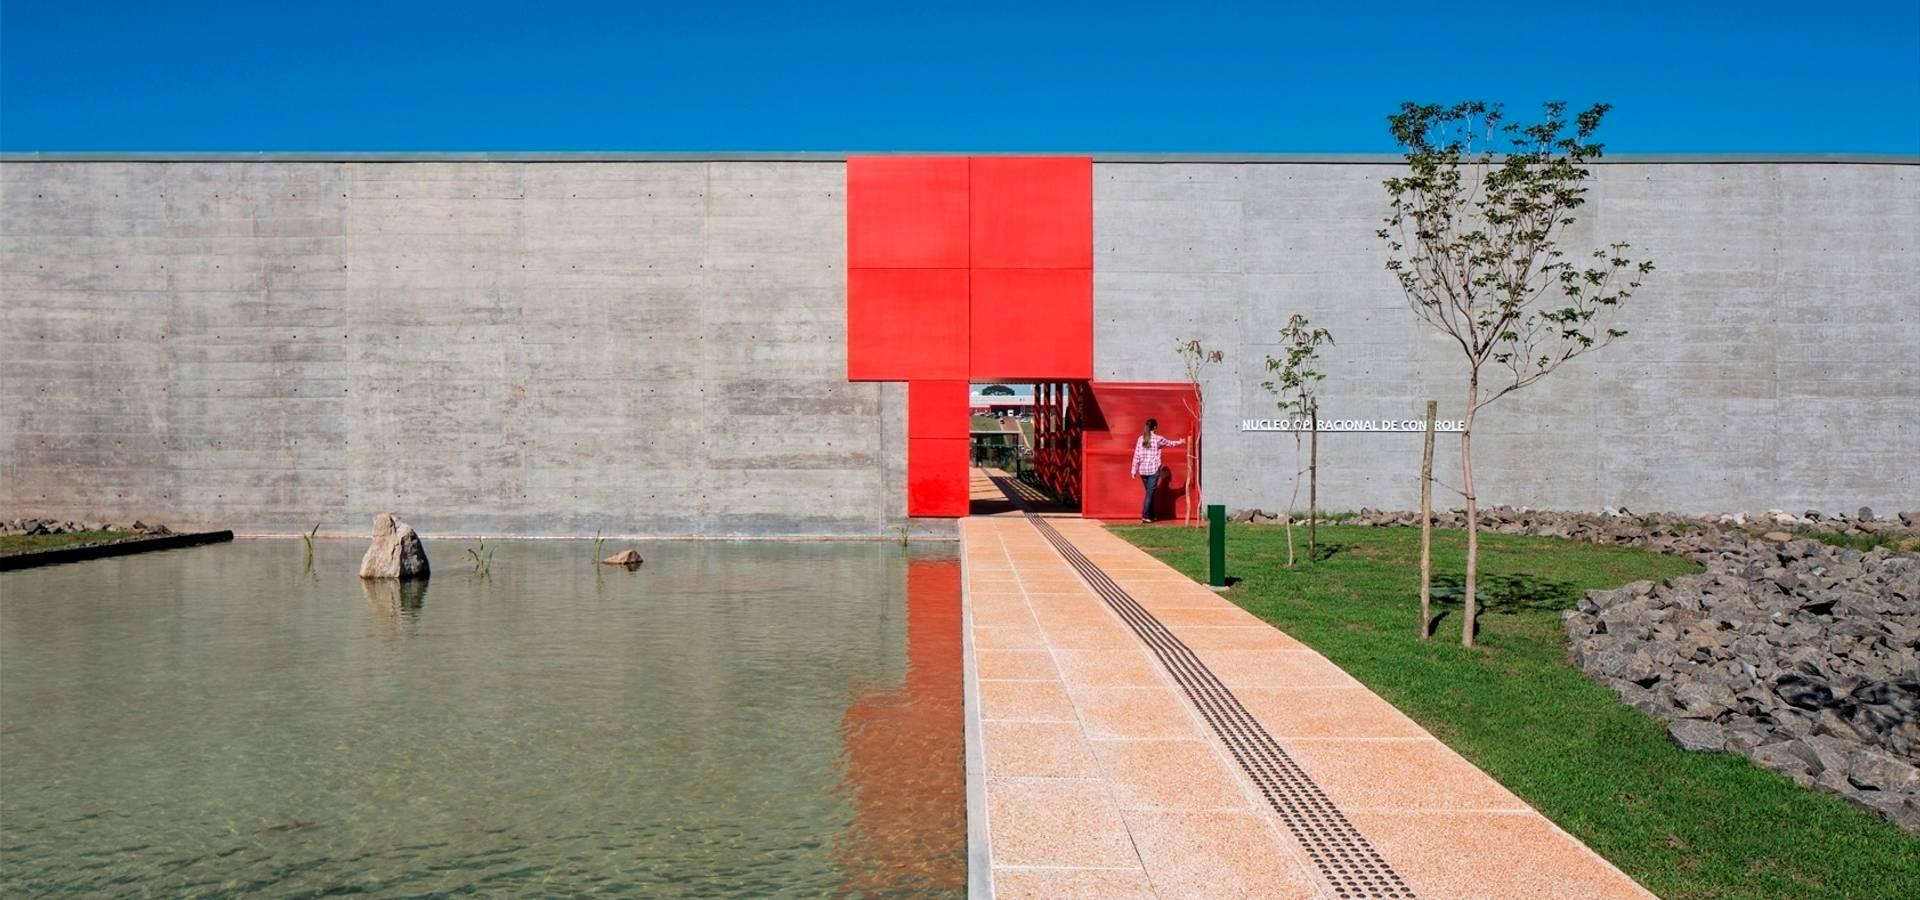 LoebCapote Arquitetura e Urbanismo